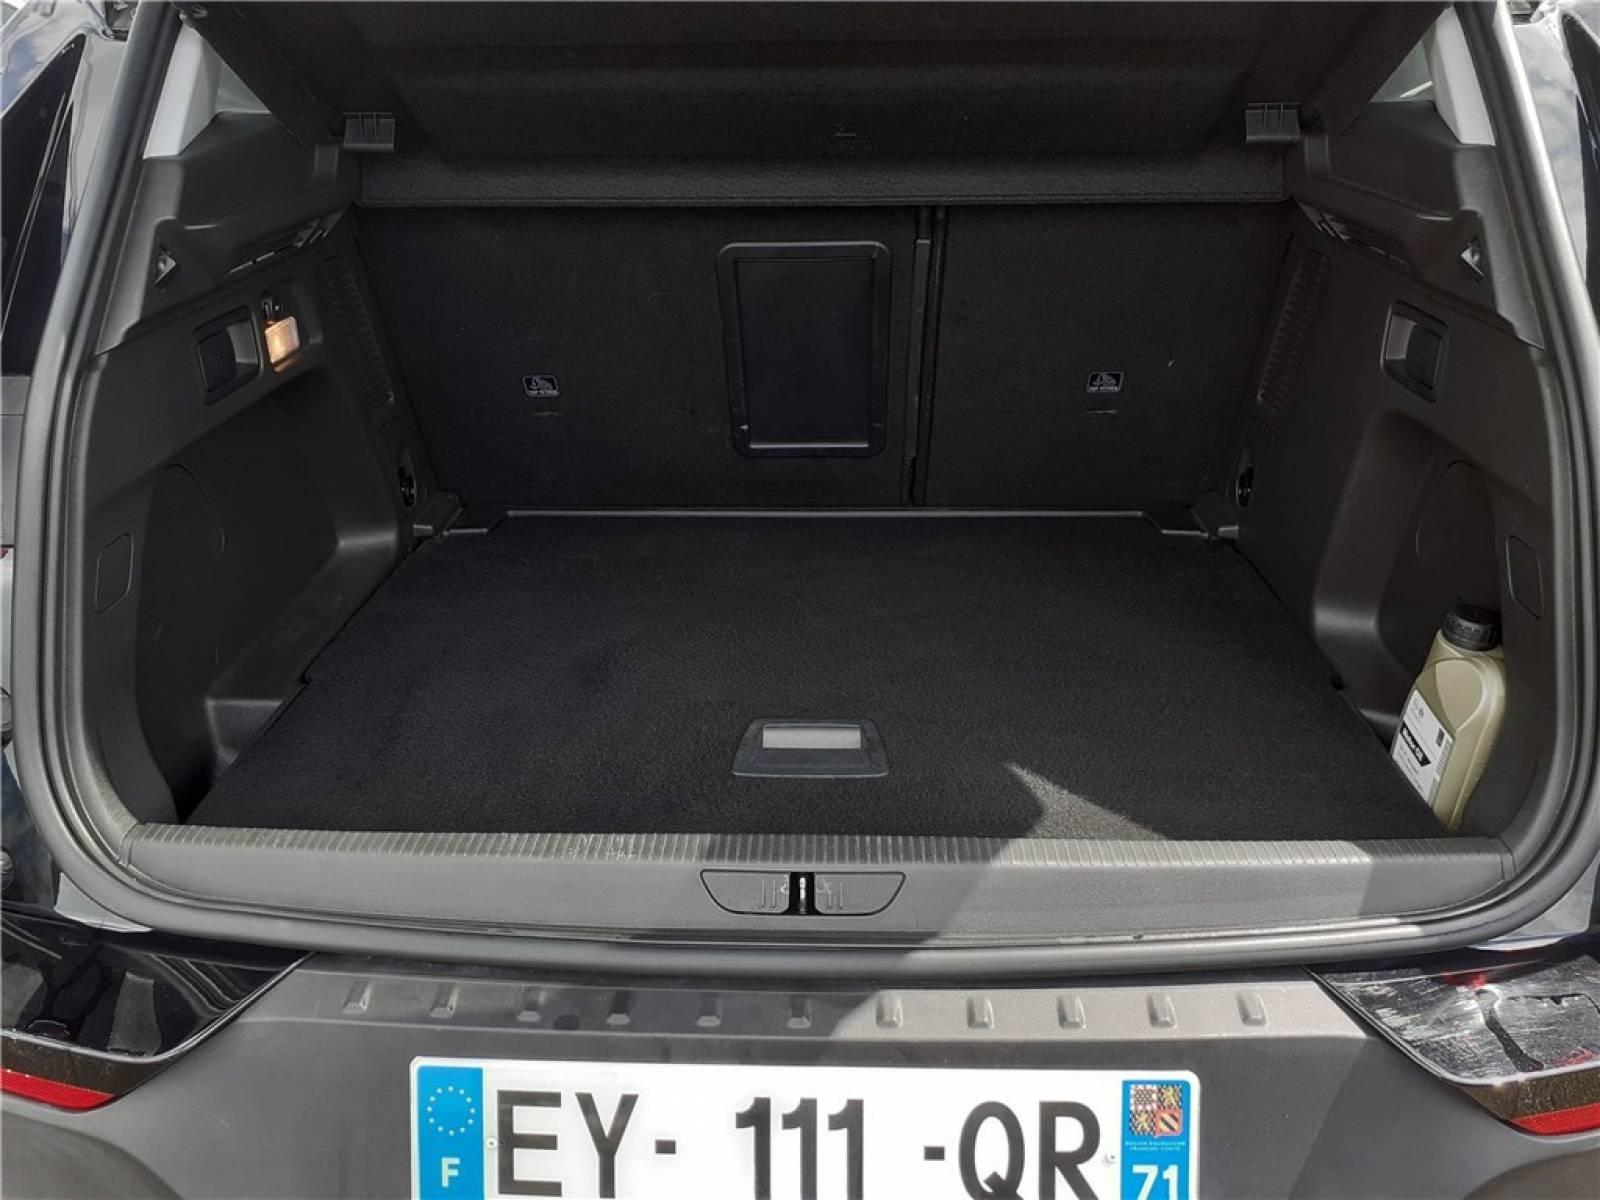 OPEL Grandland X 1.2 Turbo 130 ch BVA6 - véhicule d'occasion - Groupe Guillet - Opel Magicauto - Chalon-sur-Saône - 71380 - Saint-Marcel - 14